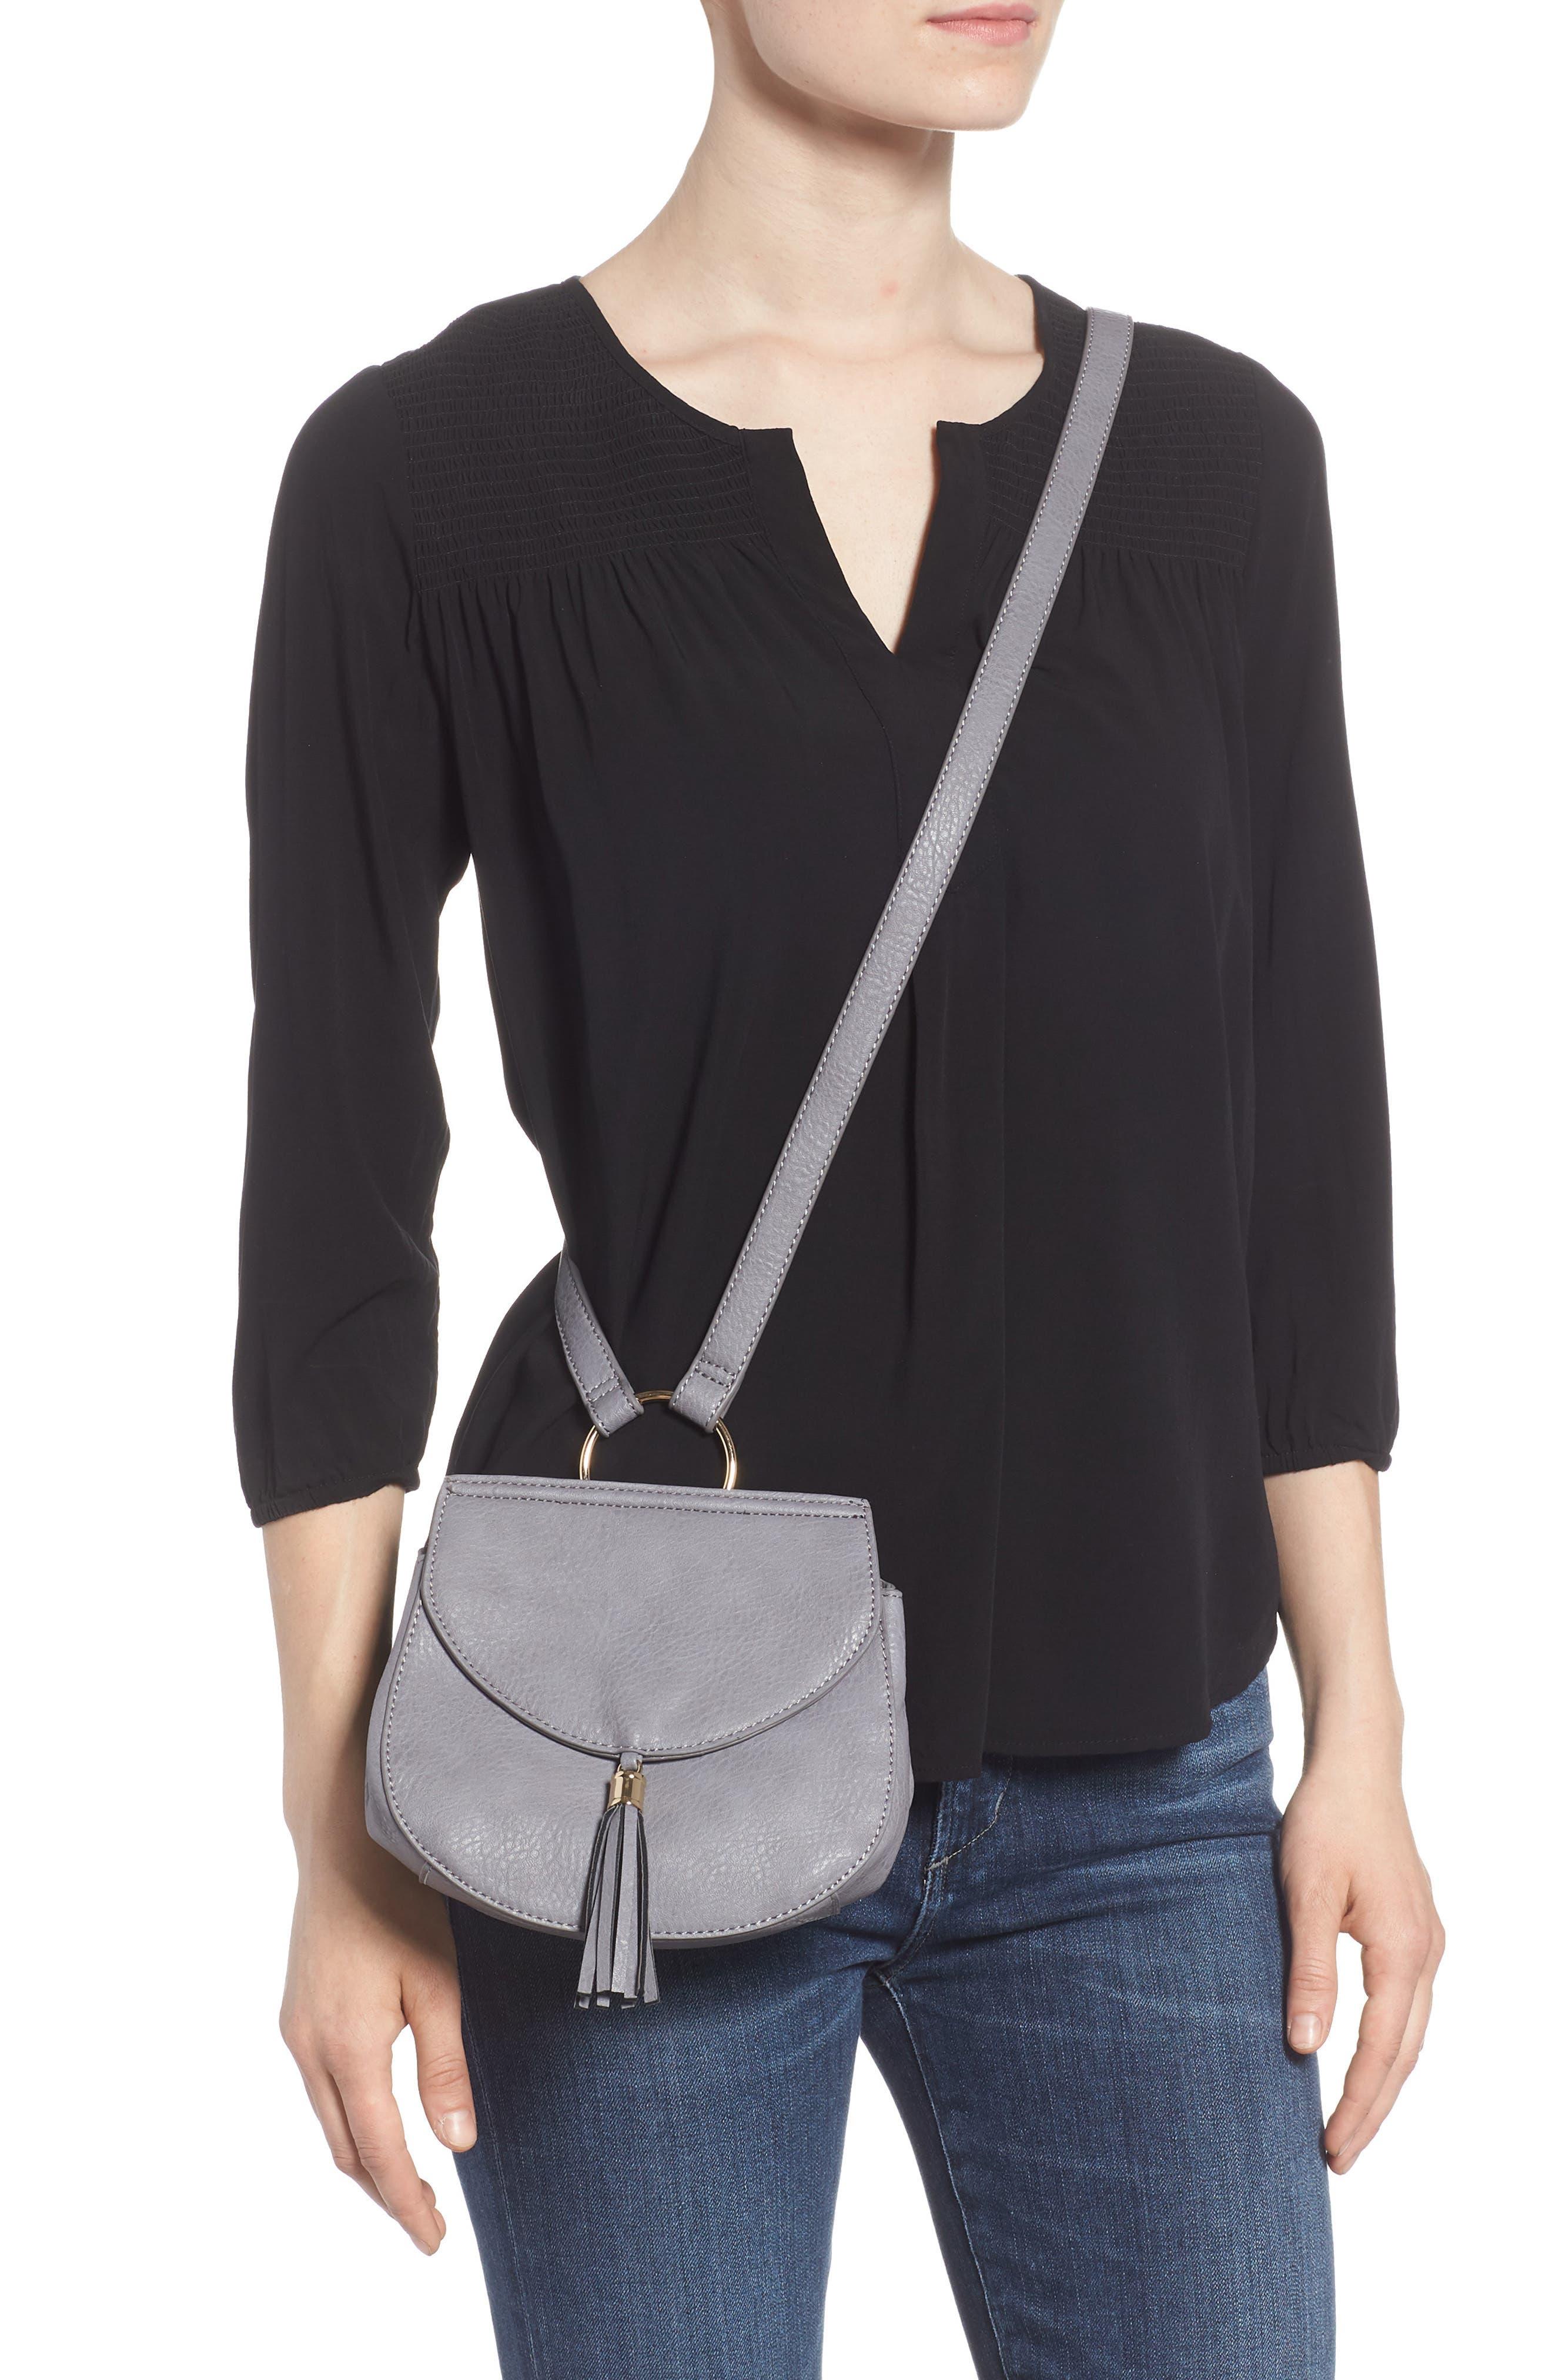 Tassel Faux Leather Crossbody Saddle Bag,                             Alternate thumbnail 3, color,